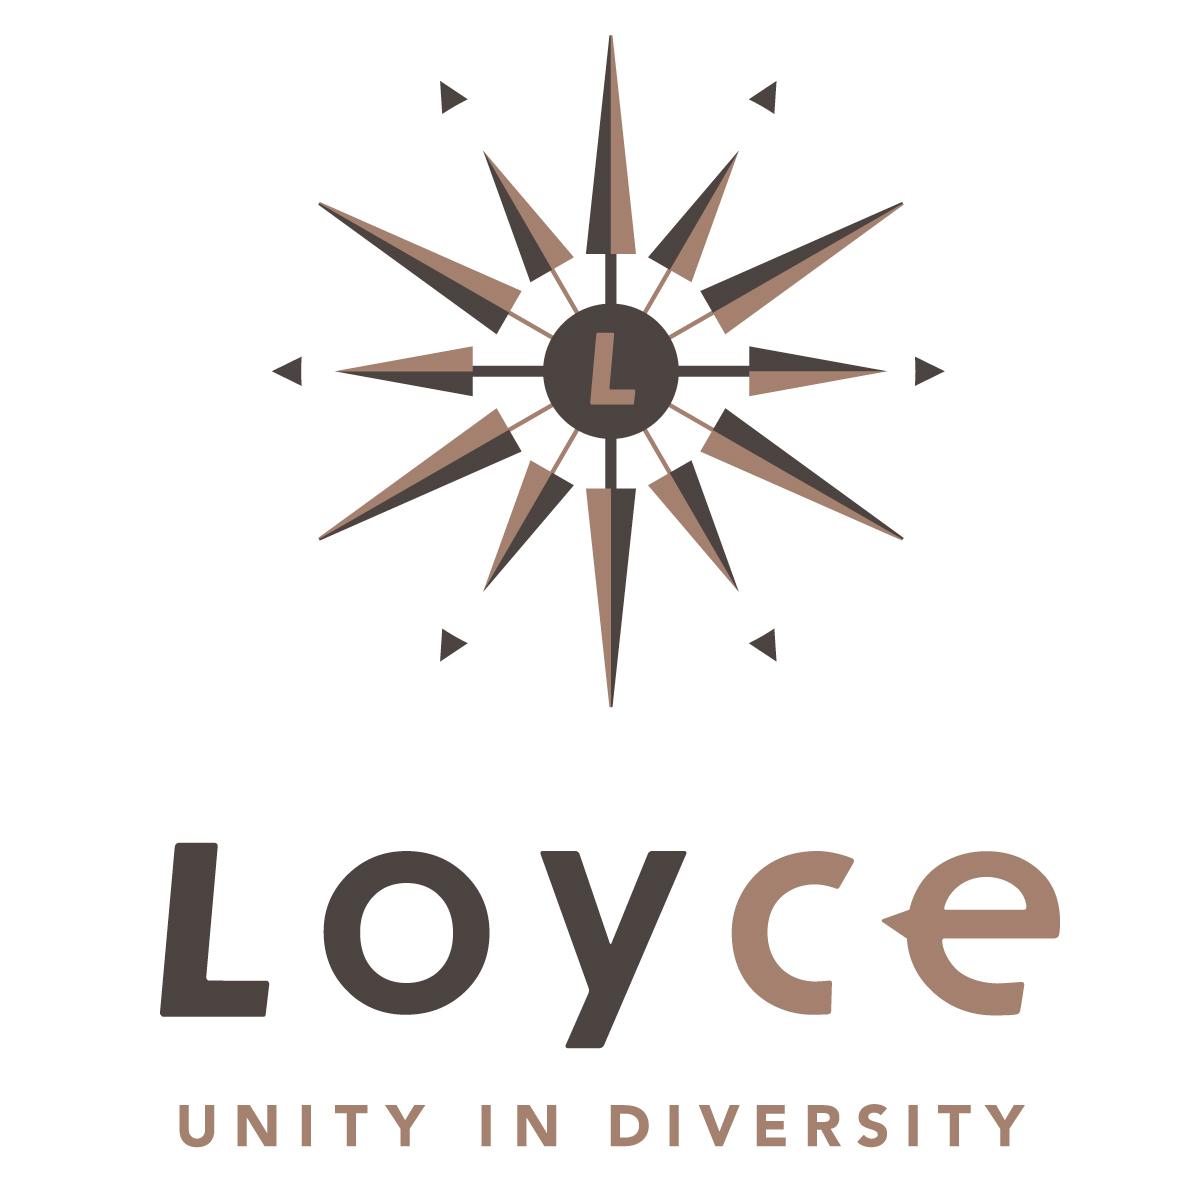 loyce_logo